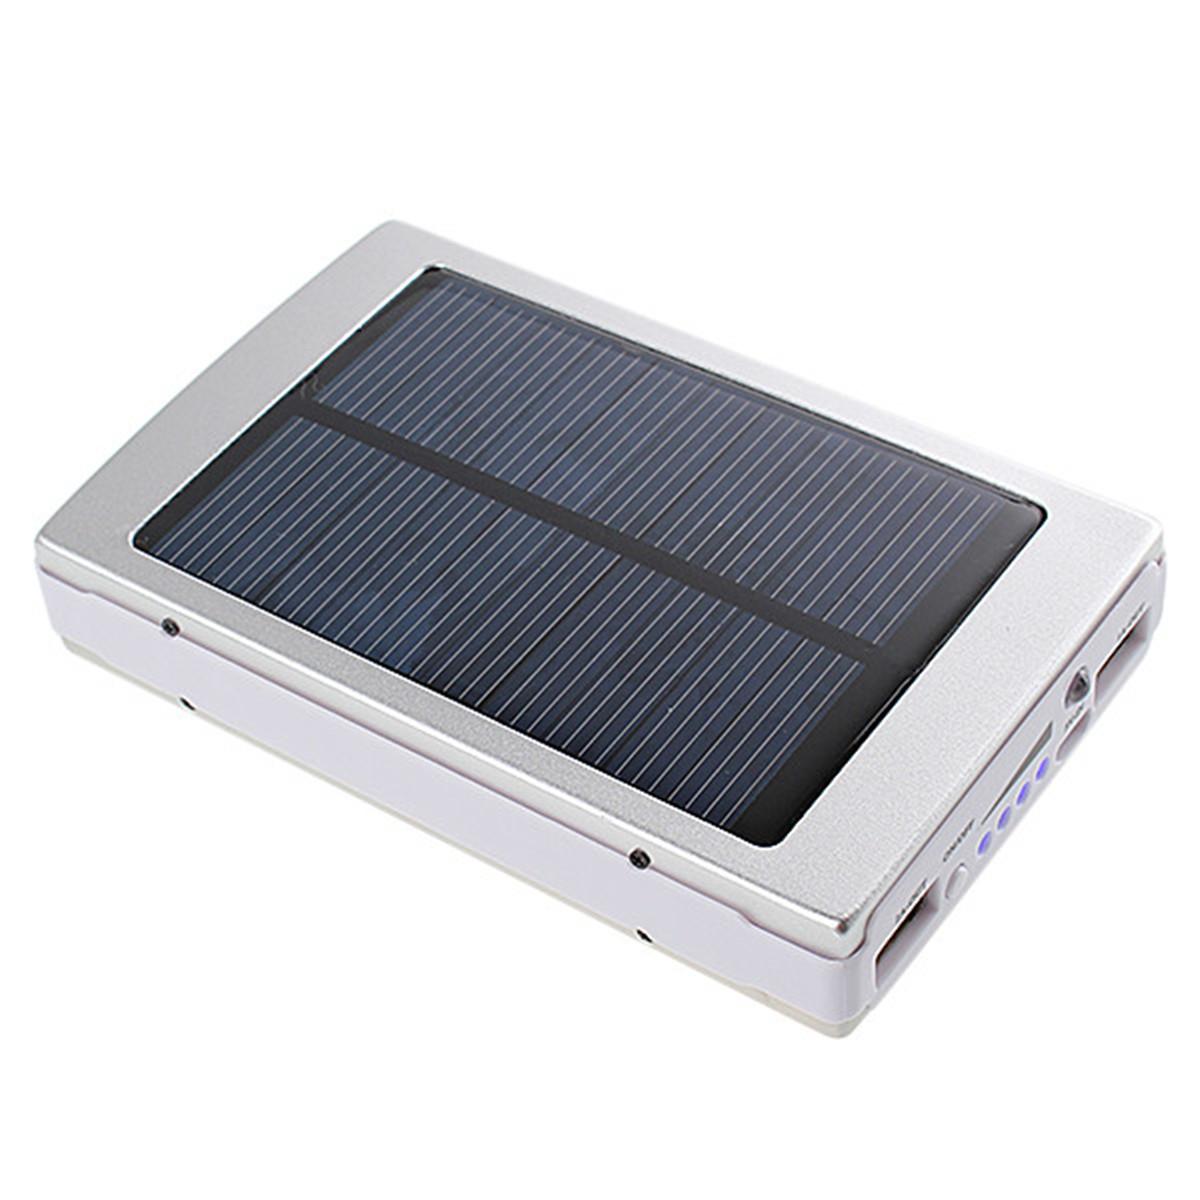 ... > Electrical & Solar > Alternative & Solar Energy > Solar Panels